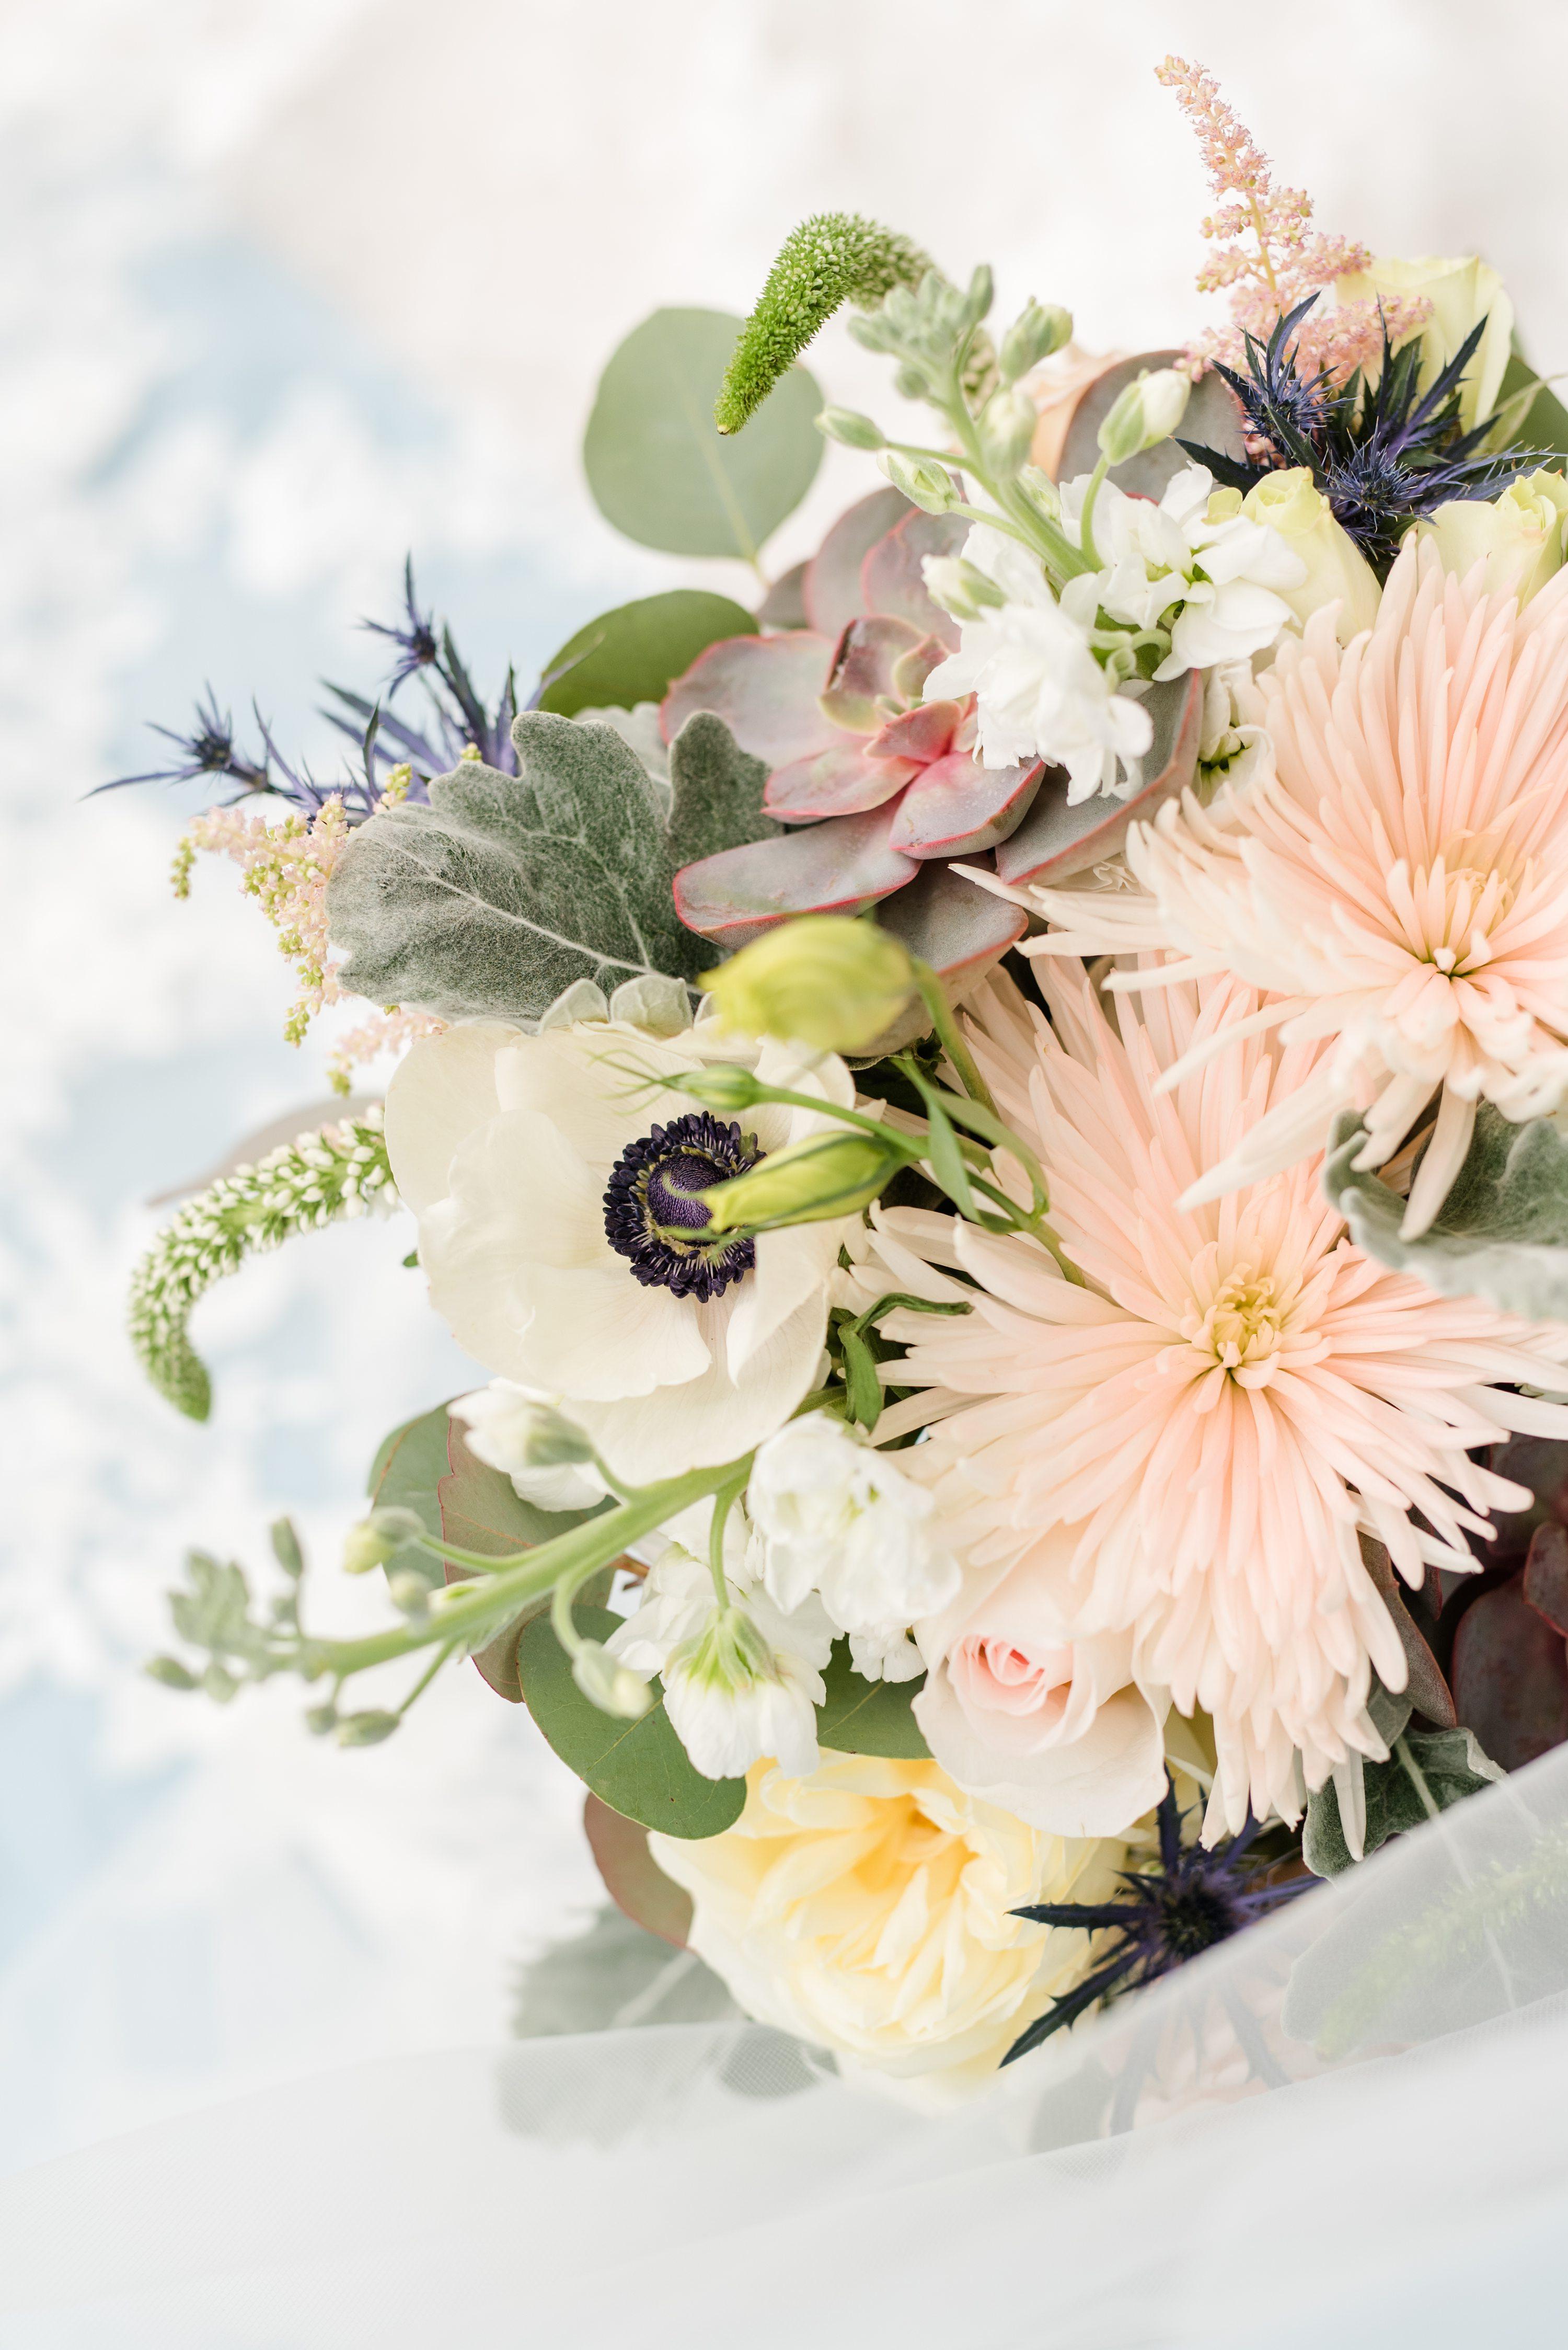 Virginia Wedding Photographer,Barn Wedding,flowers,floral bouquet,wedding bouquet,harris teeter,florals